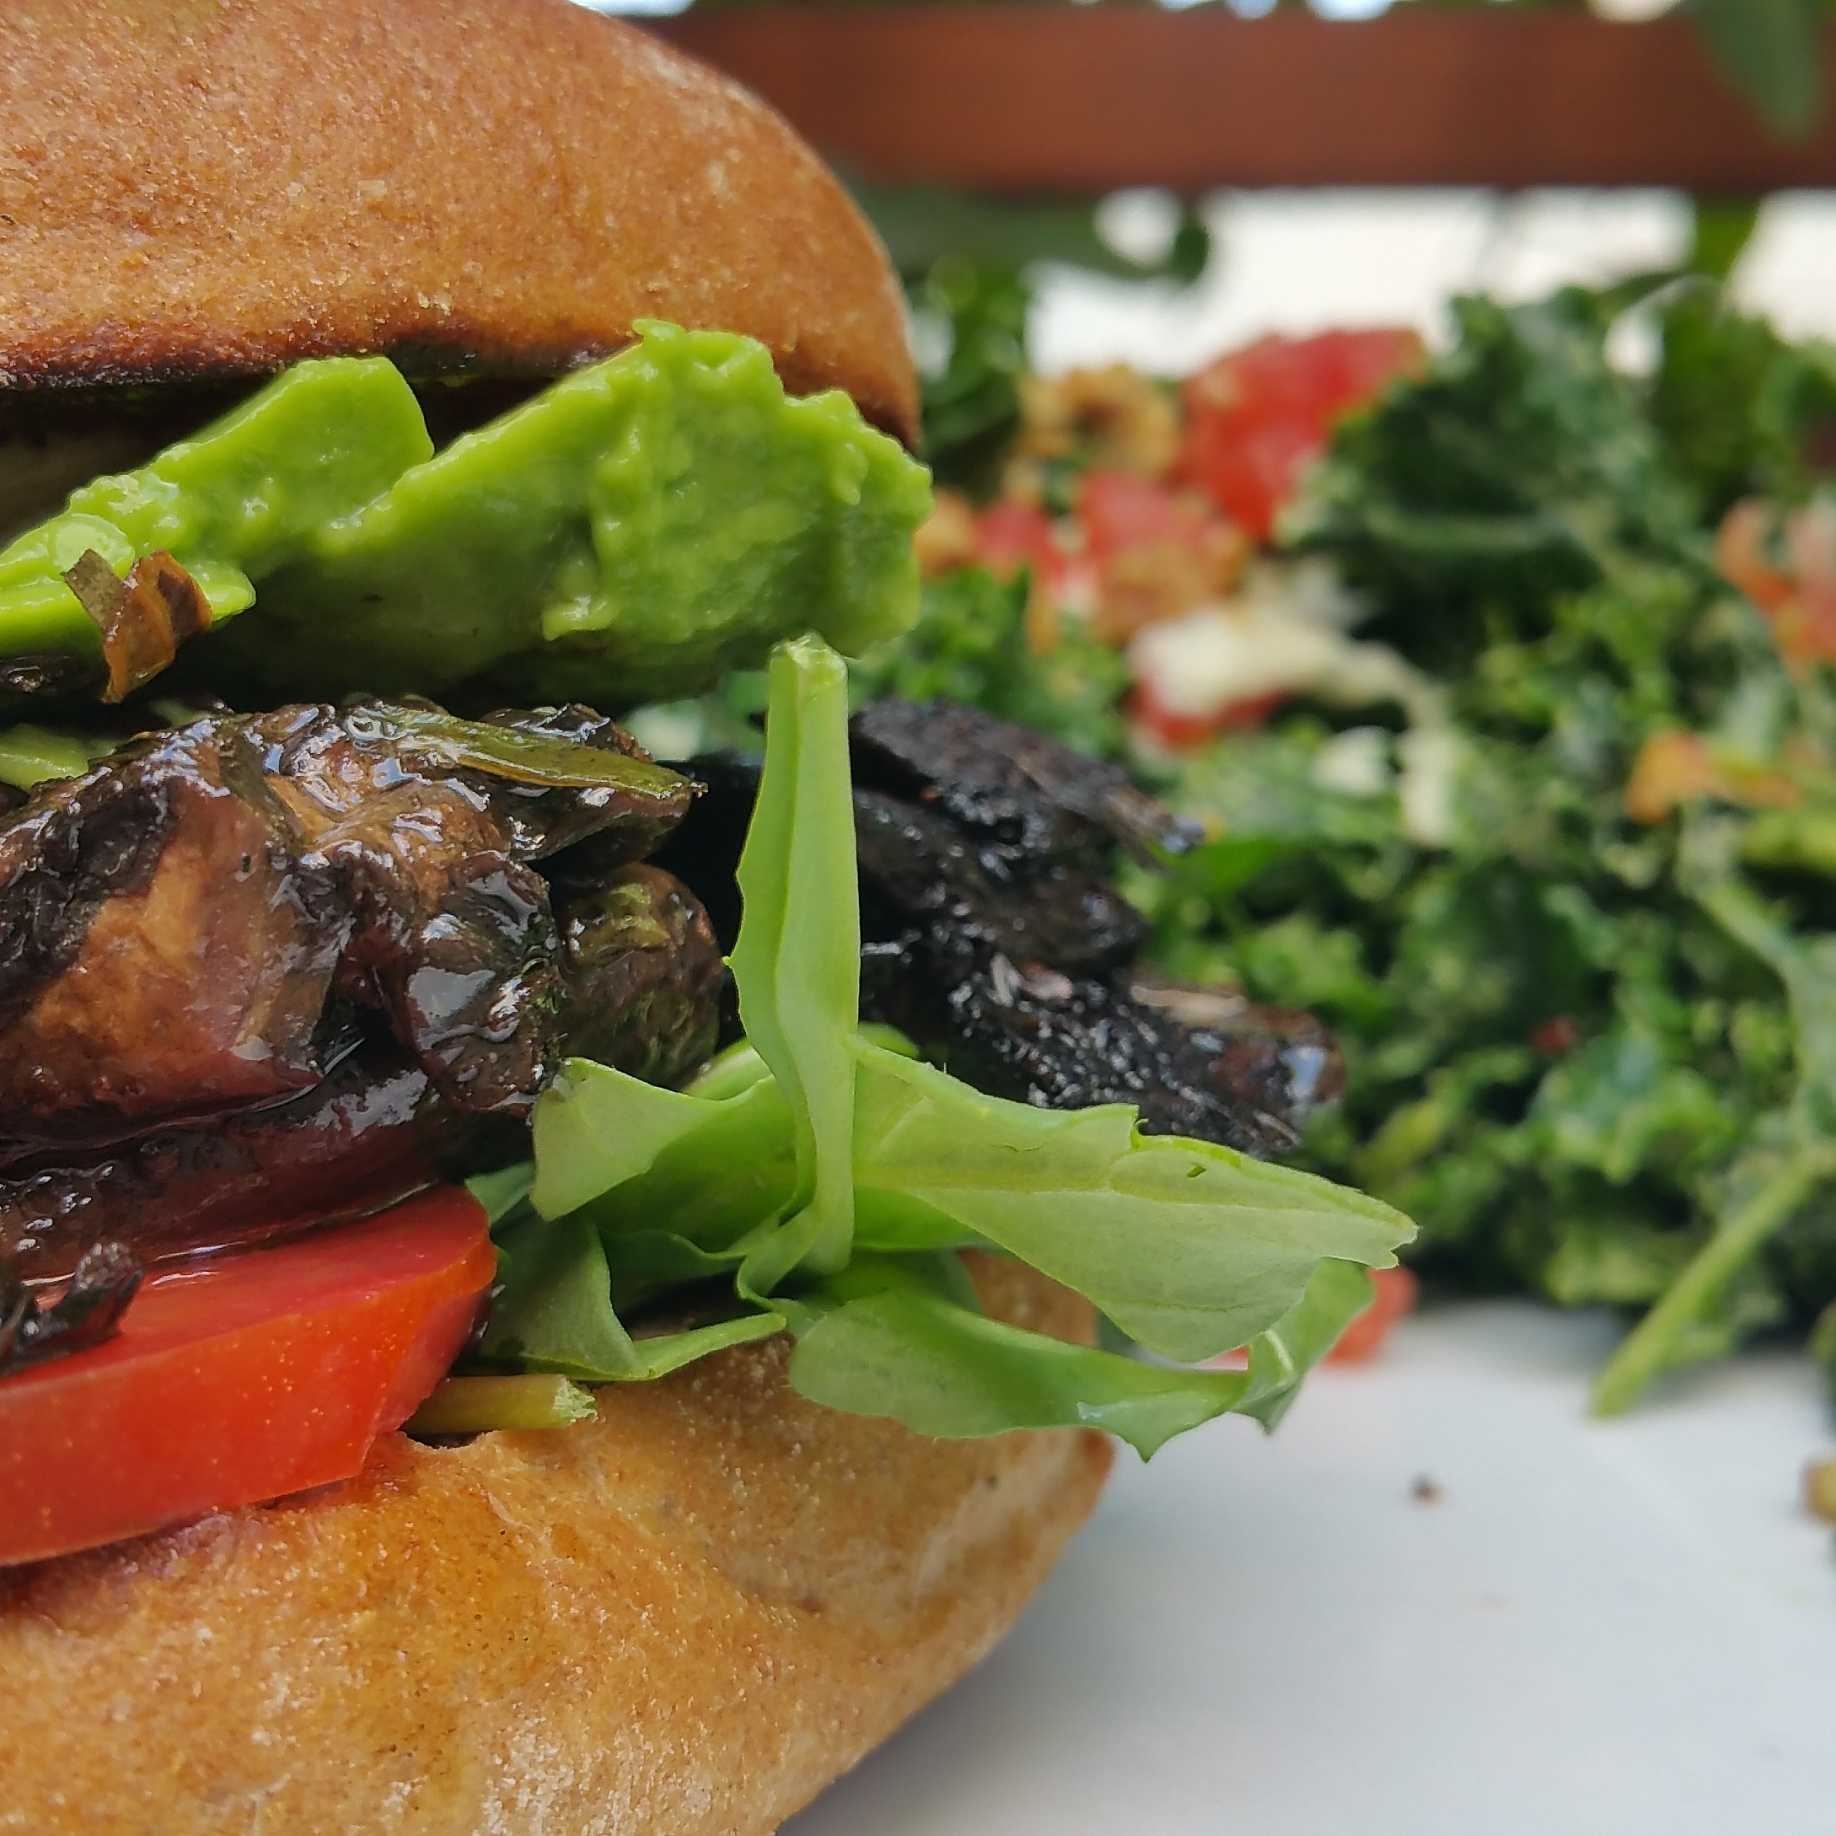 Portobello Sandwich from Sun Cafe photo by Michael Castaneda